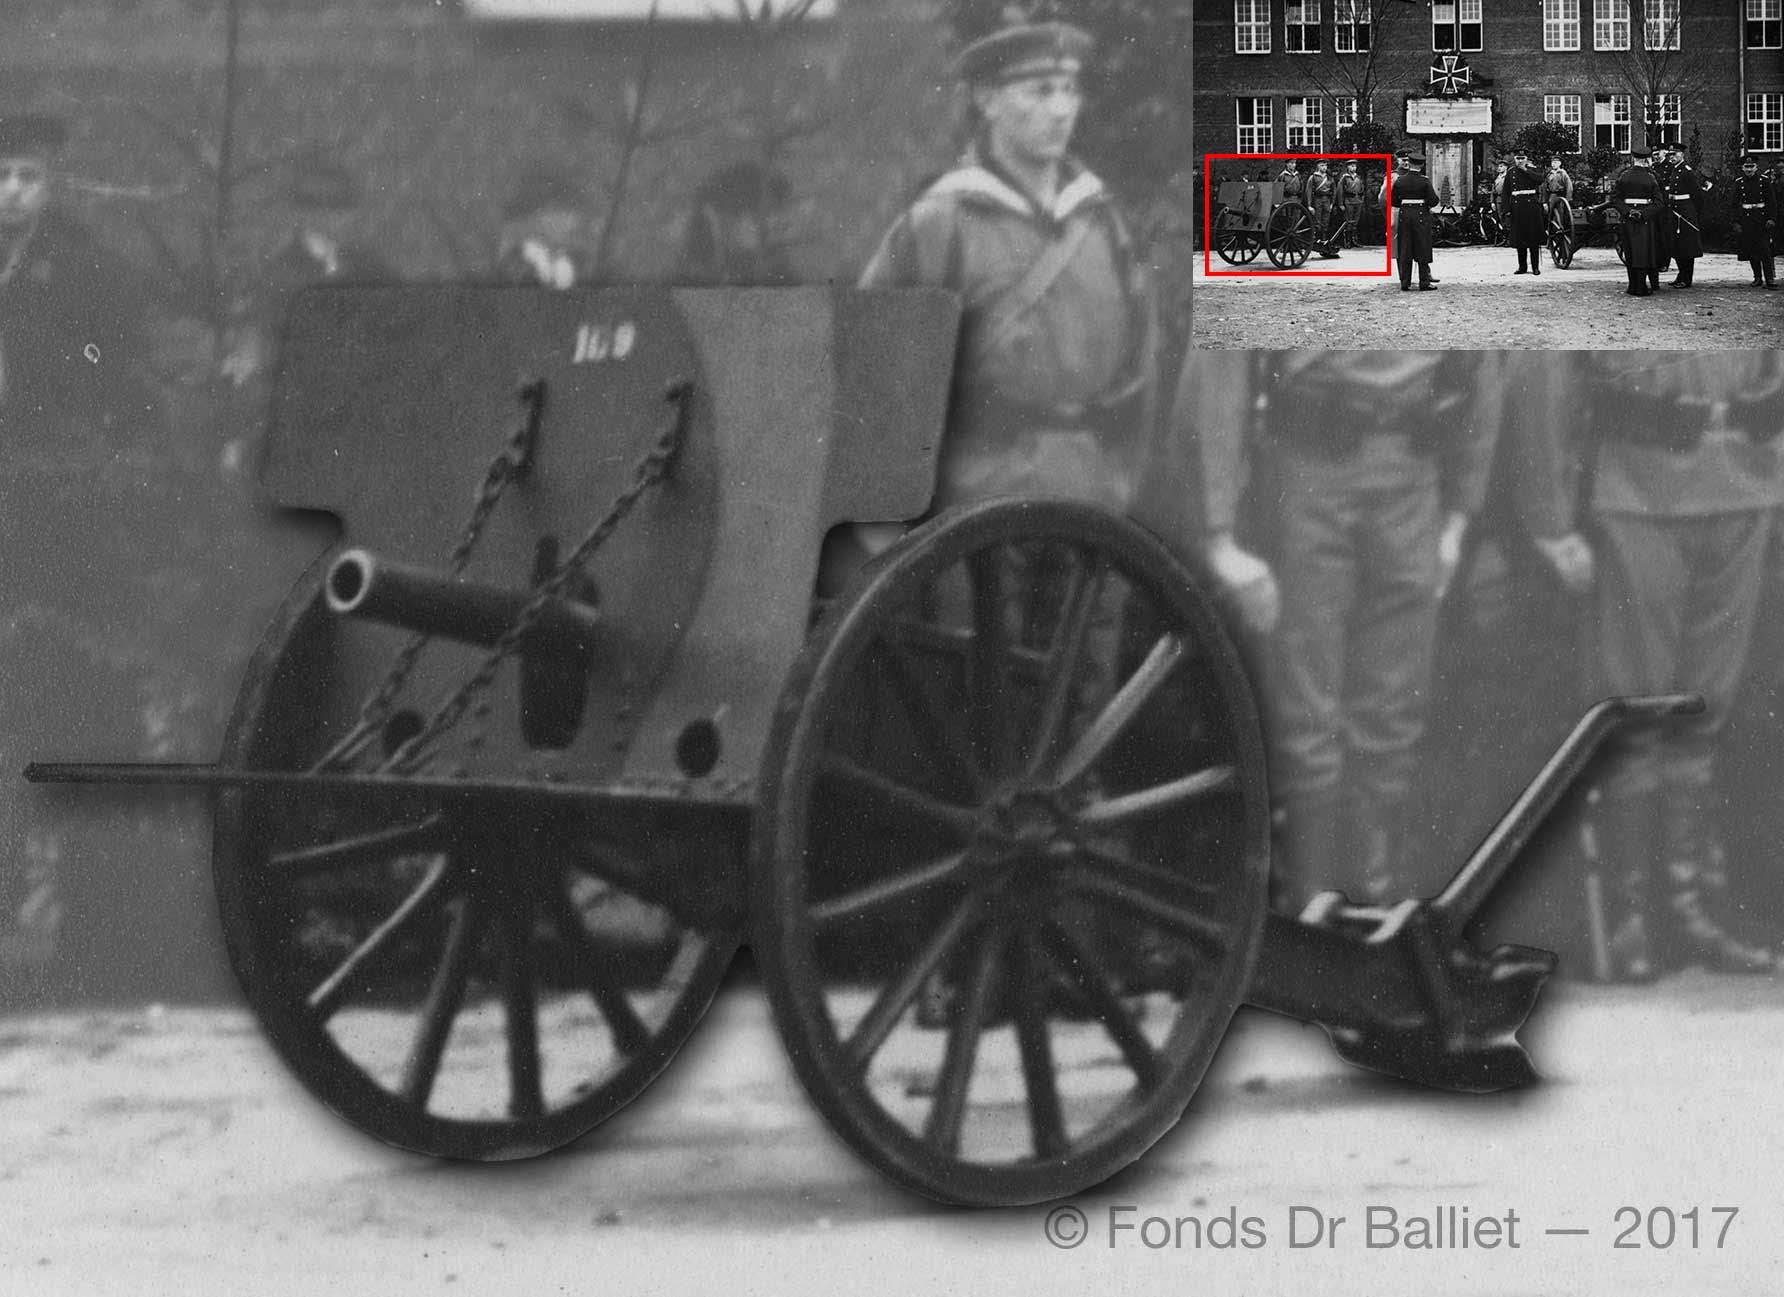 http://www.artillerie.info/Image-server/6-cm-bts-K-L21-Landungslafette-2r.jpg